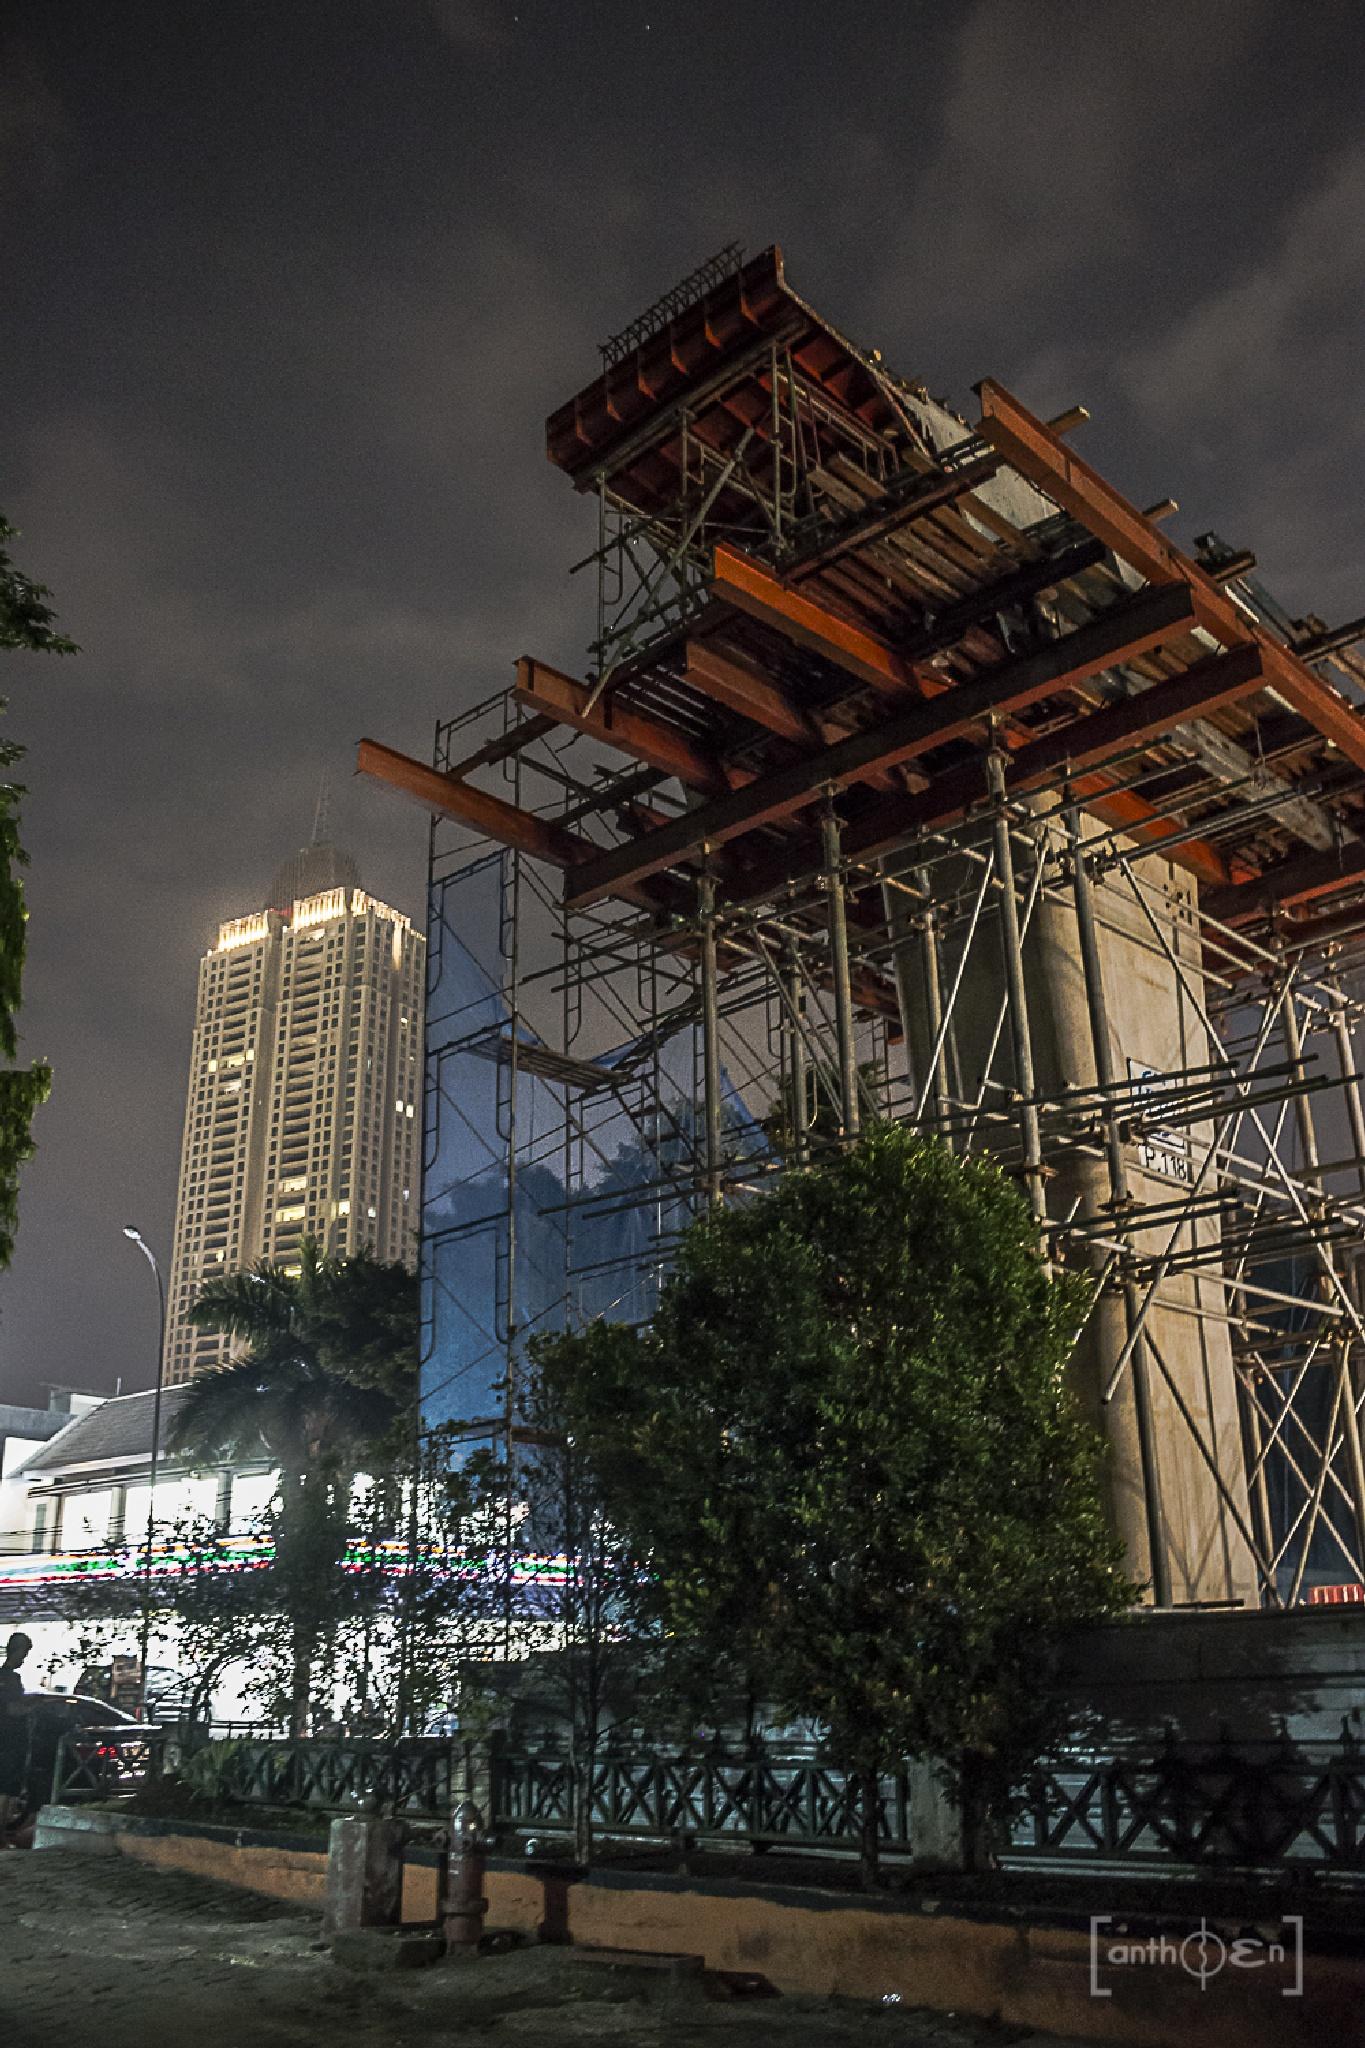 High Way Construction by Anthoen Luciferano Karnanta